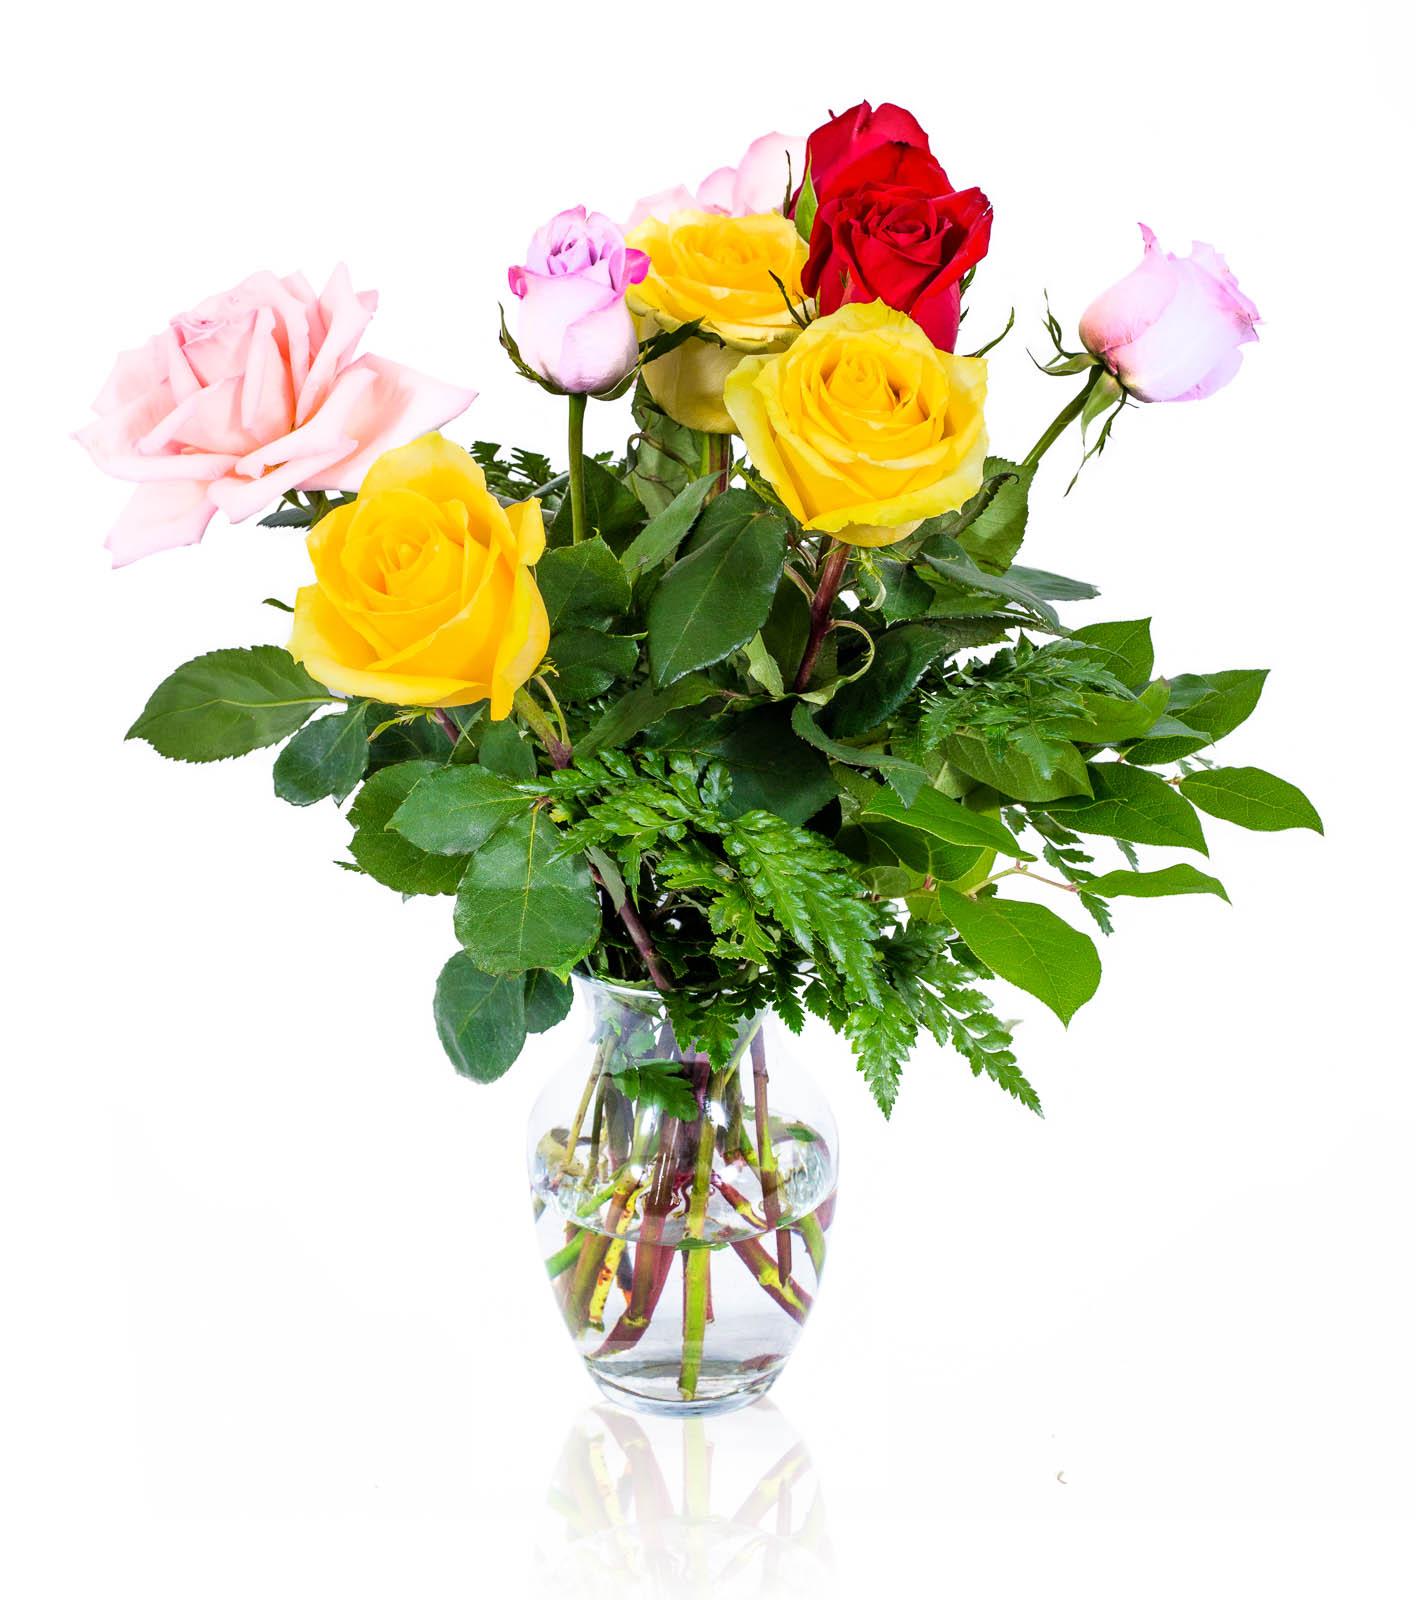 Flwerz one dozen roses fresh cut hand made luxury bouquet of flowers flwerz one dozen roses fresh cut hand made izmirmasajfo